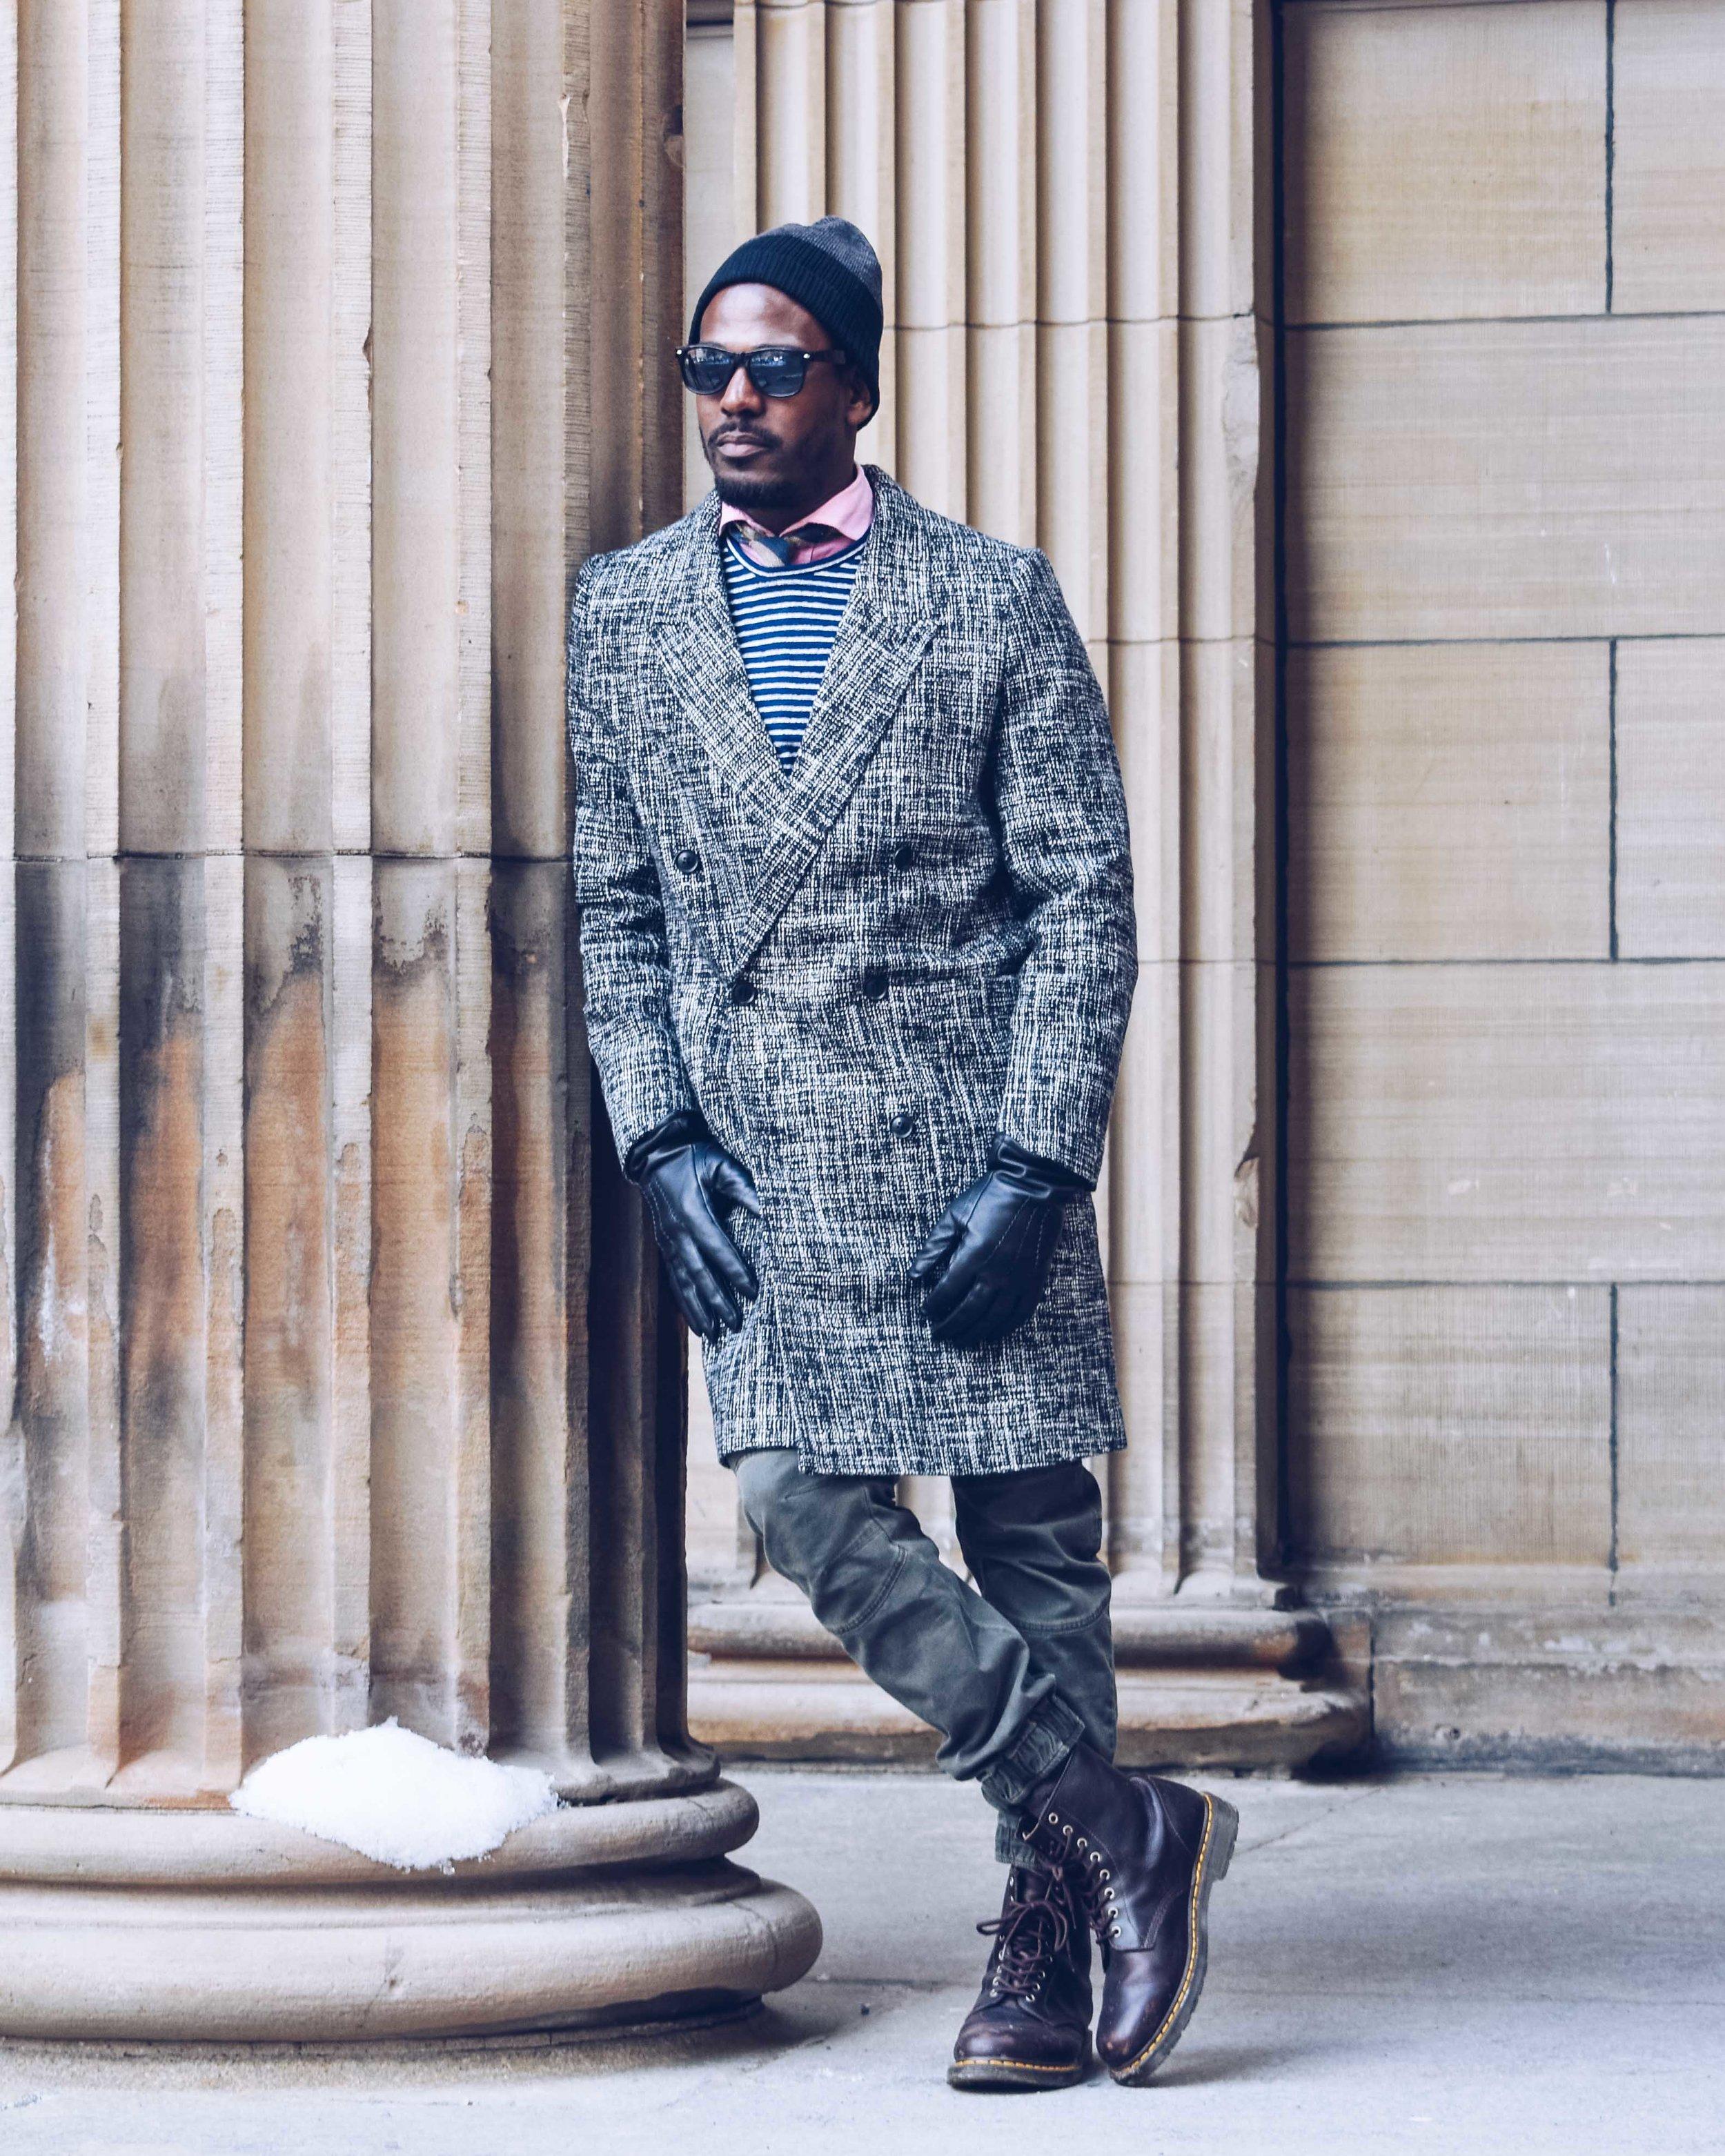 montreal style asos new look mens fashion overcoat dr martens 2018 greg mcgregorson gregsstyleguide